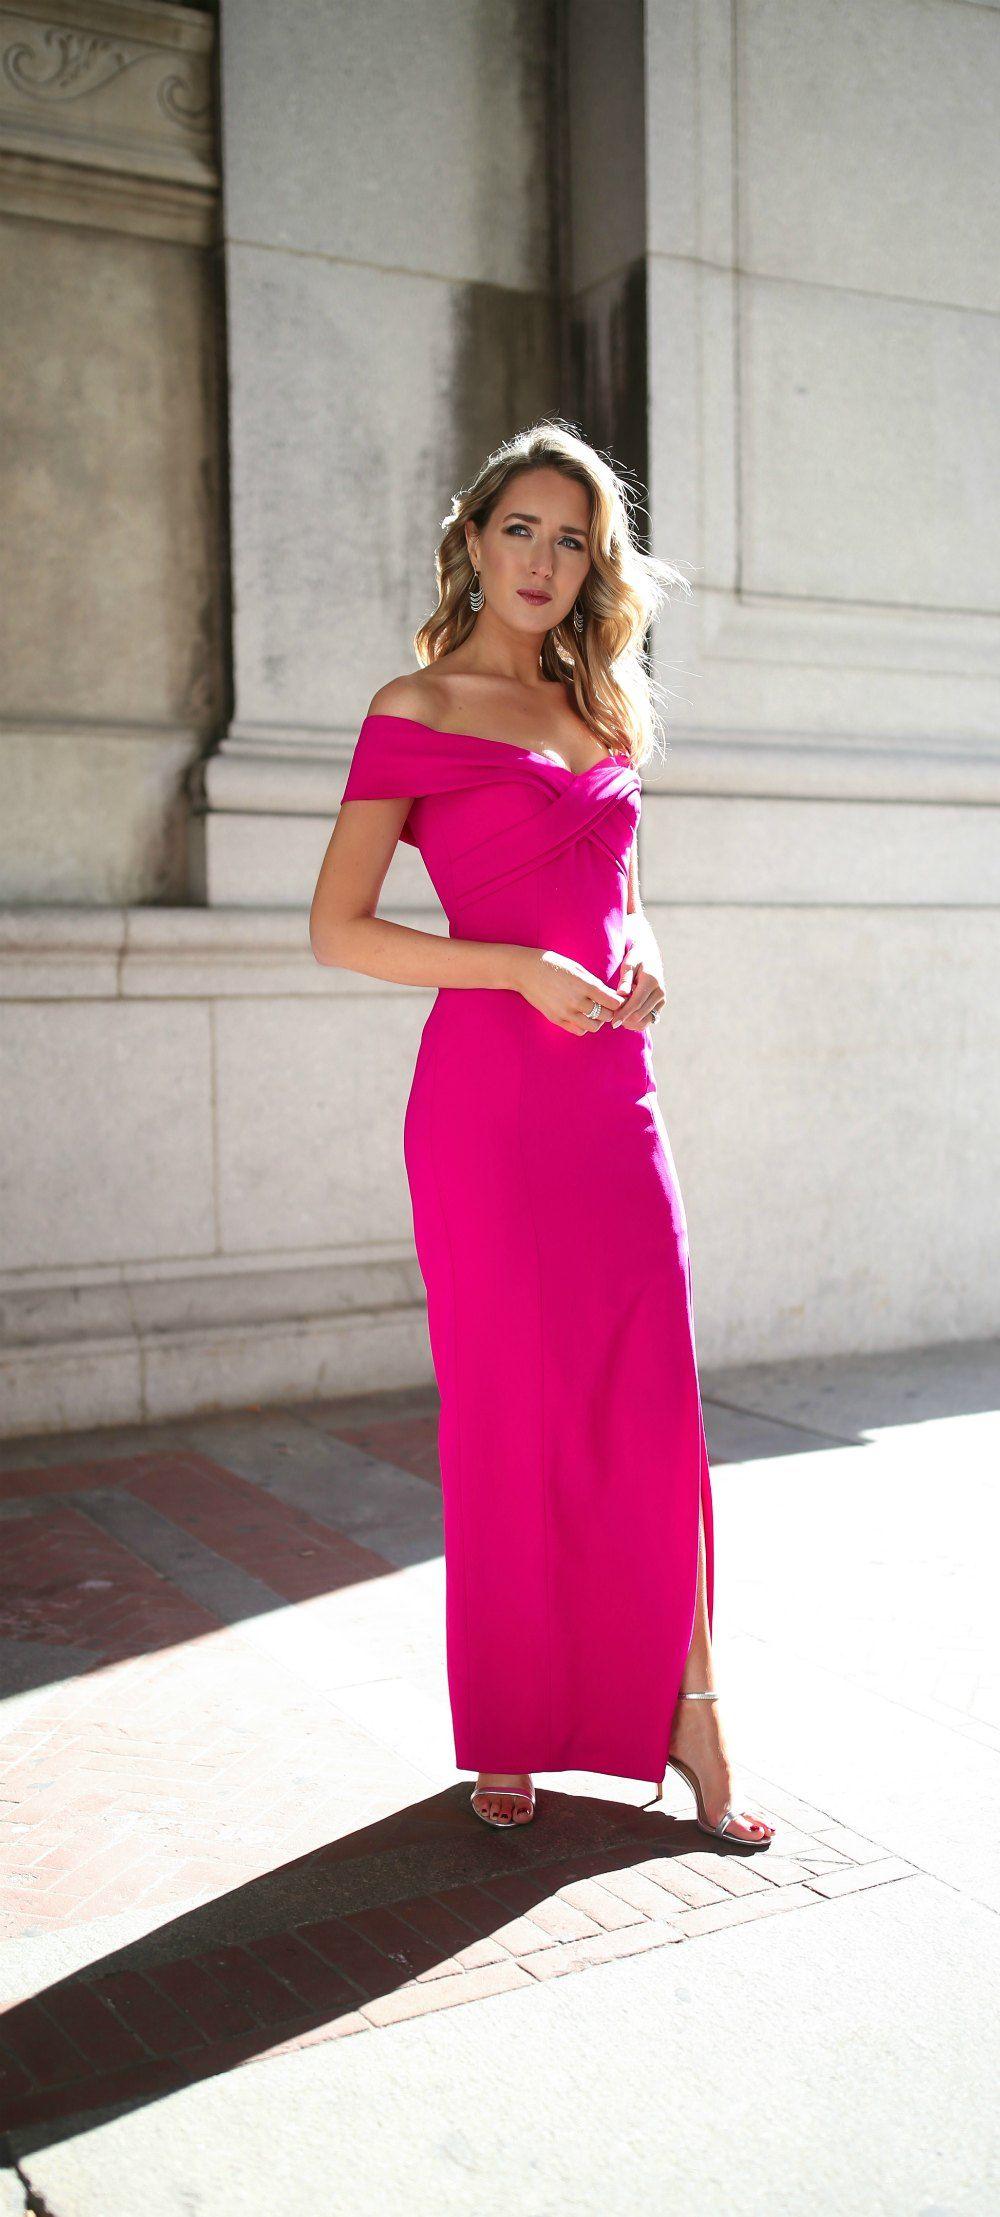 What To Wear To A Black Tie Wedding Floor Length Fuschia Pink Formal Gown With Off Black Tie Wedding Attire Black Tie Wedding Guest Dress Black Tie Wedding [ 2217 x 1000 Pixel ]